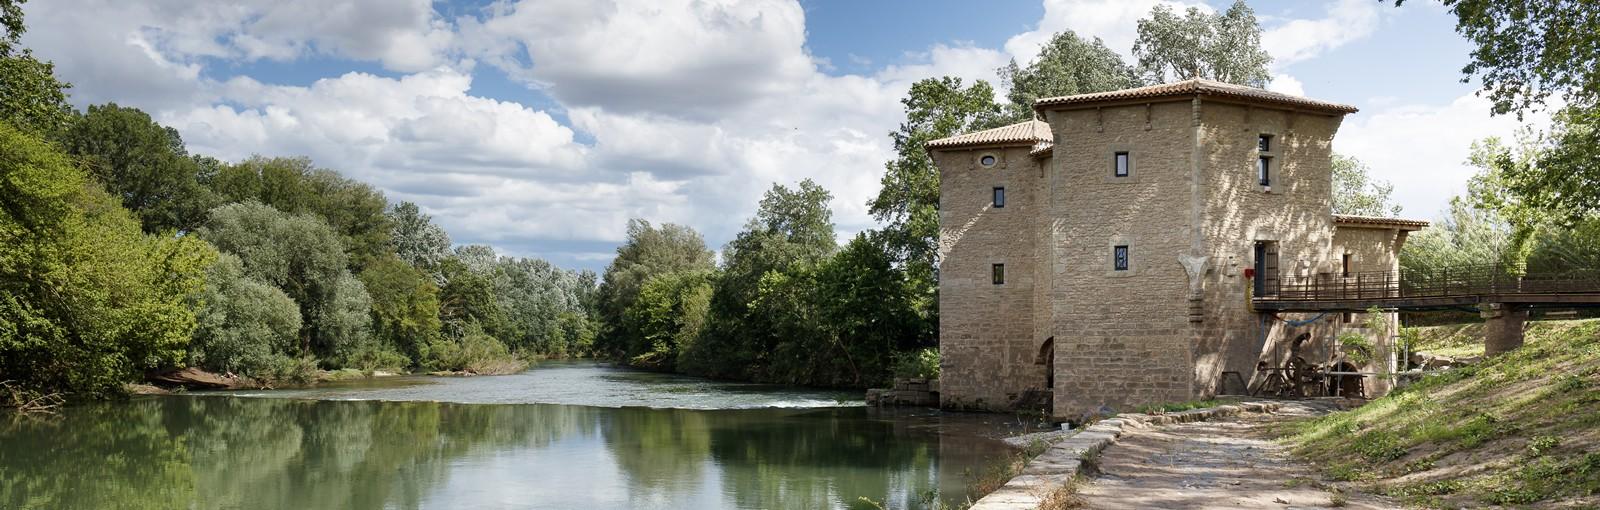 Une semaine en Languedoc